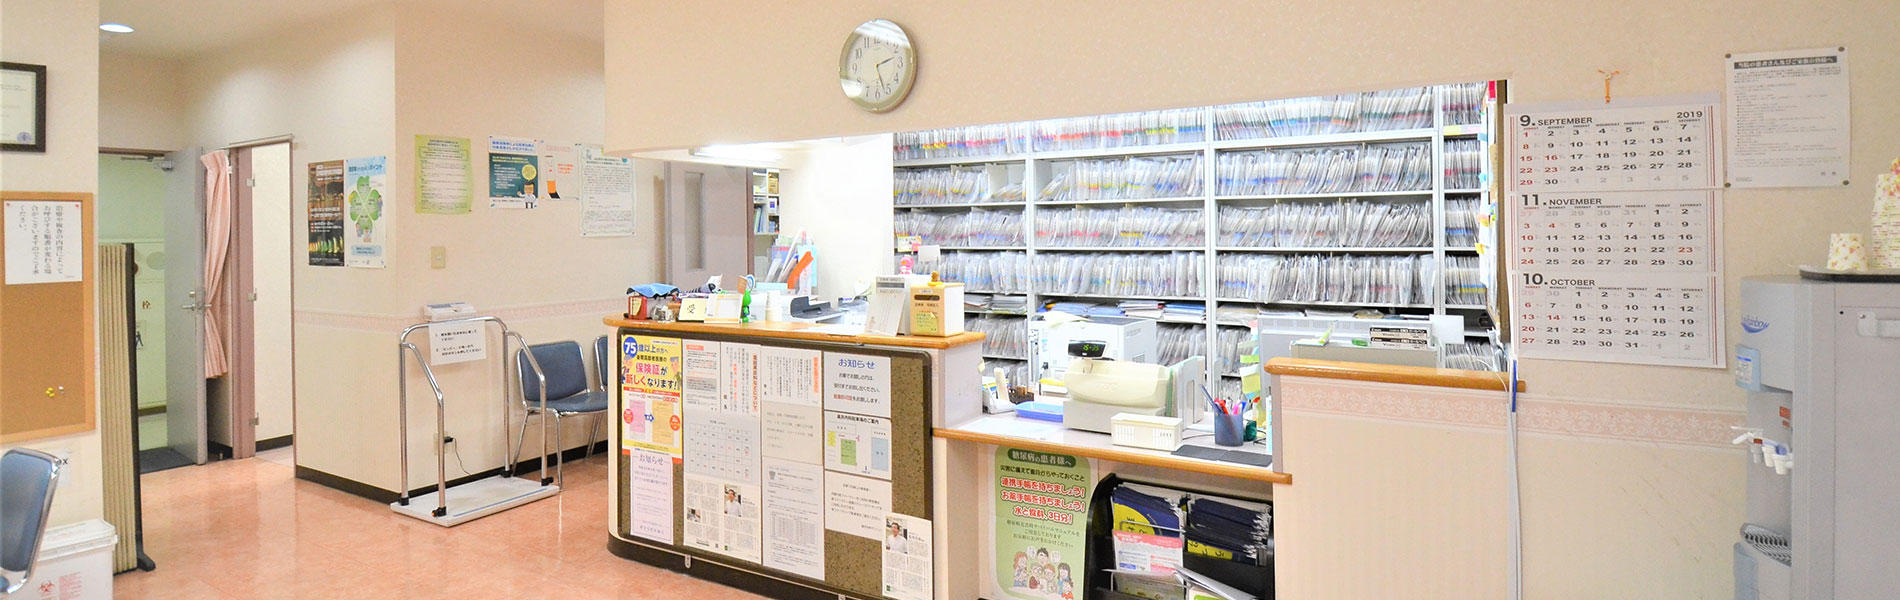 日本糖尿病学会専門医(名医)が在籍する内科病院